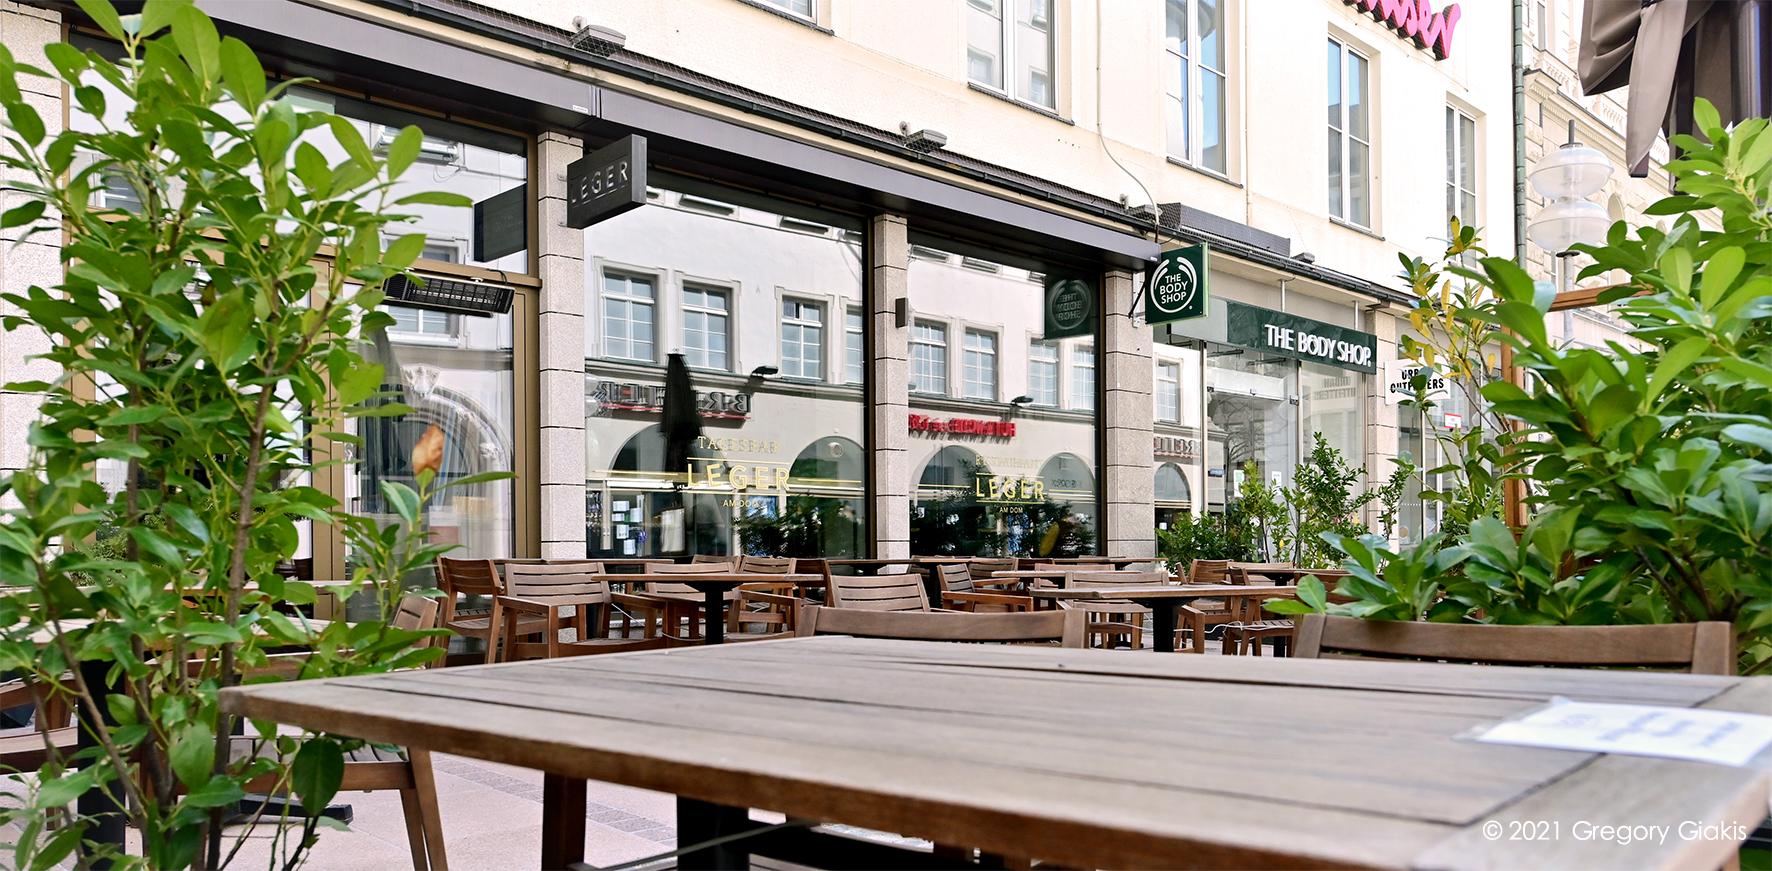 Mόναχο: 10.000 λιγότεροι εργαζόμενοι στην εστίαση και στα ξενοδοχεία